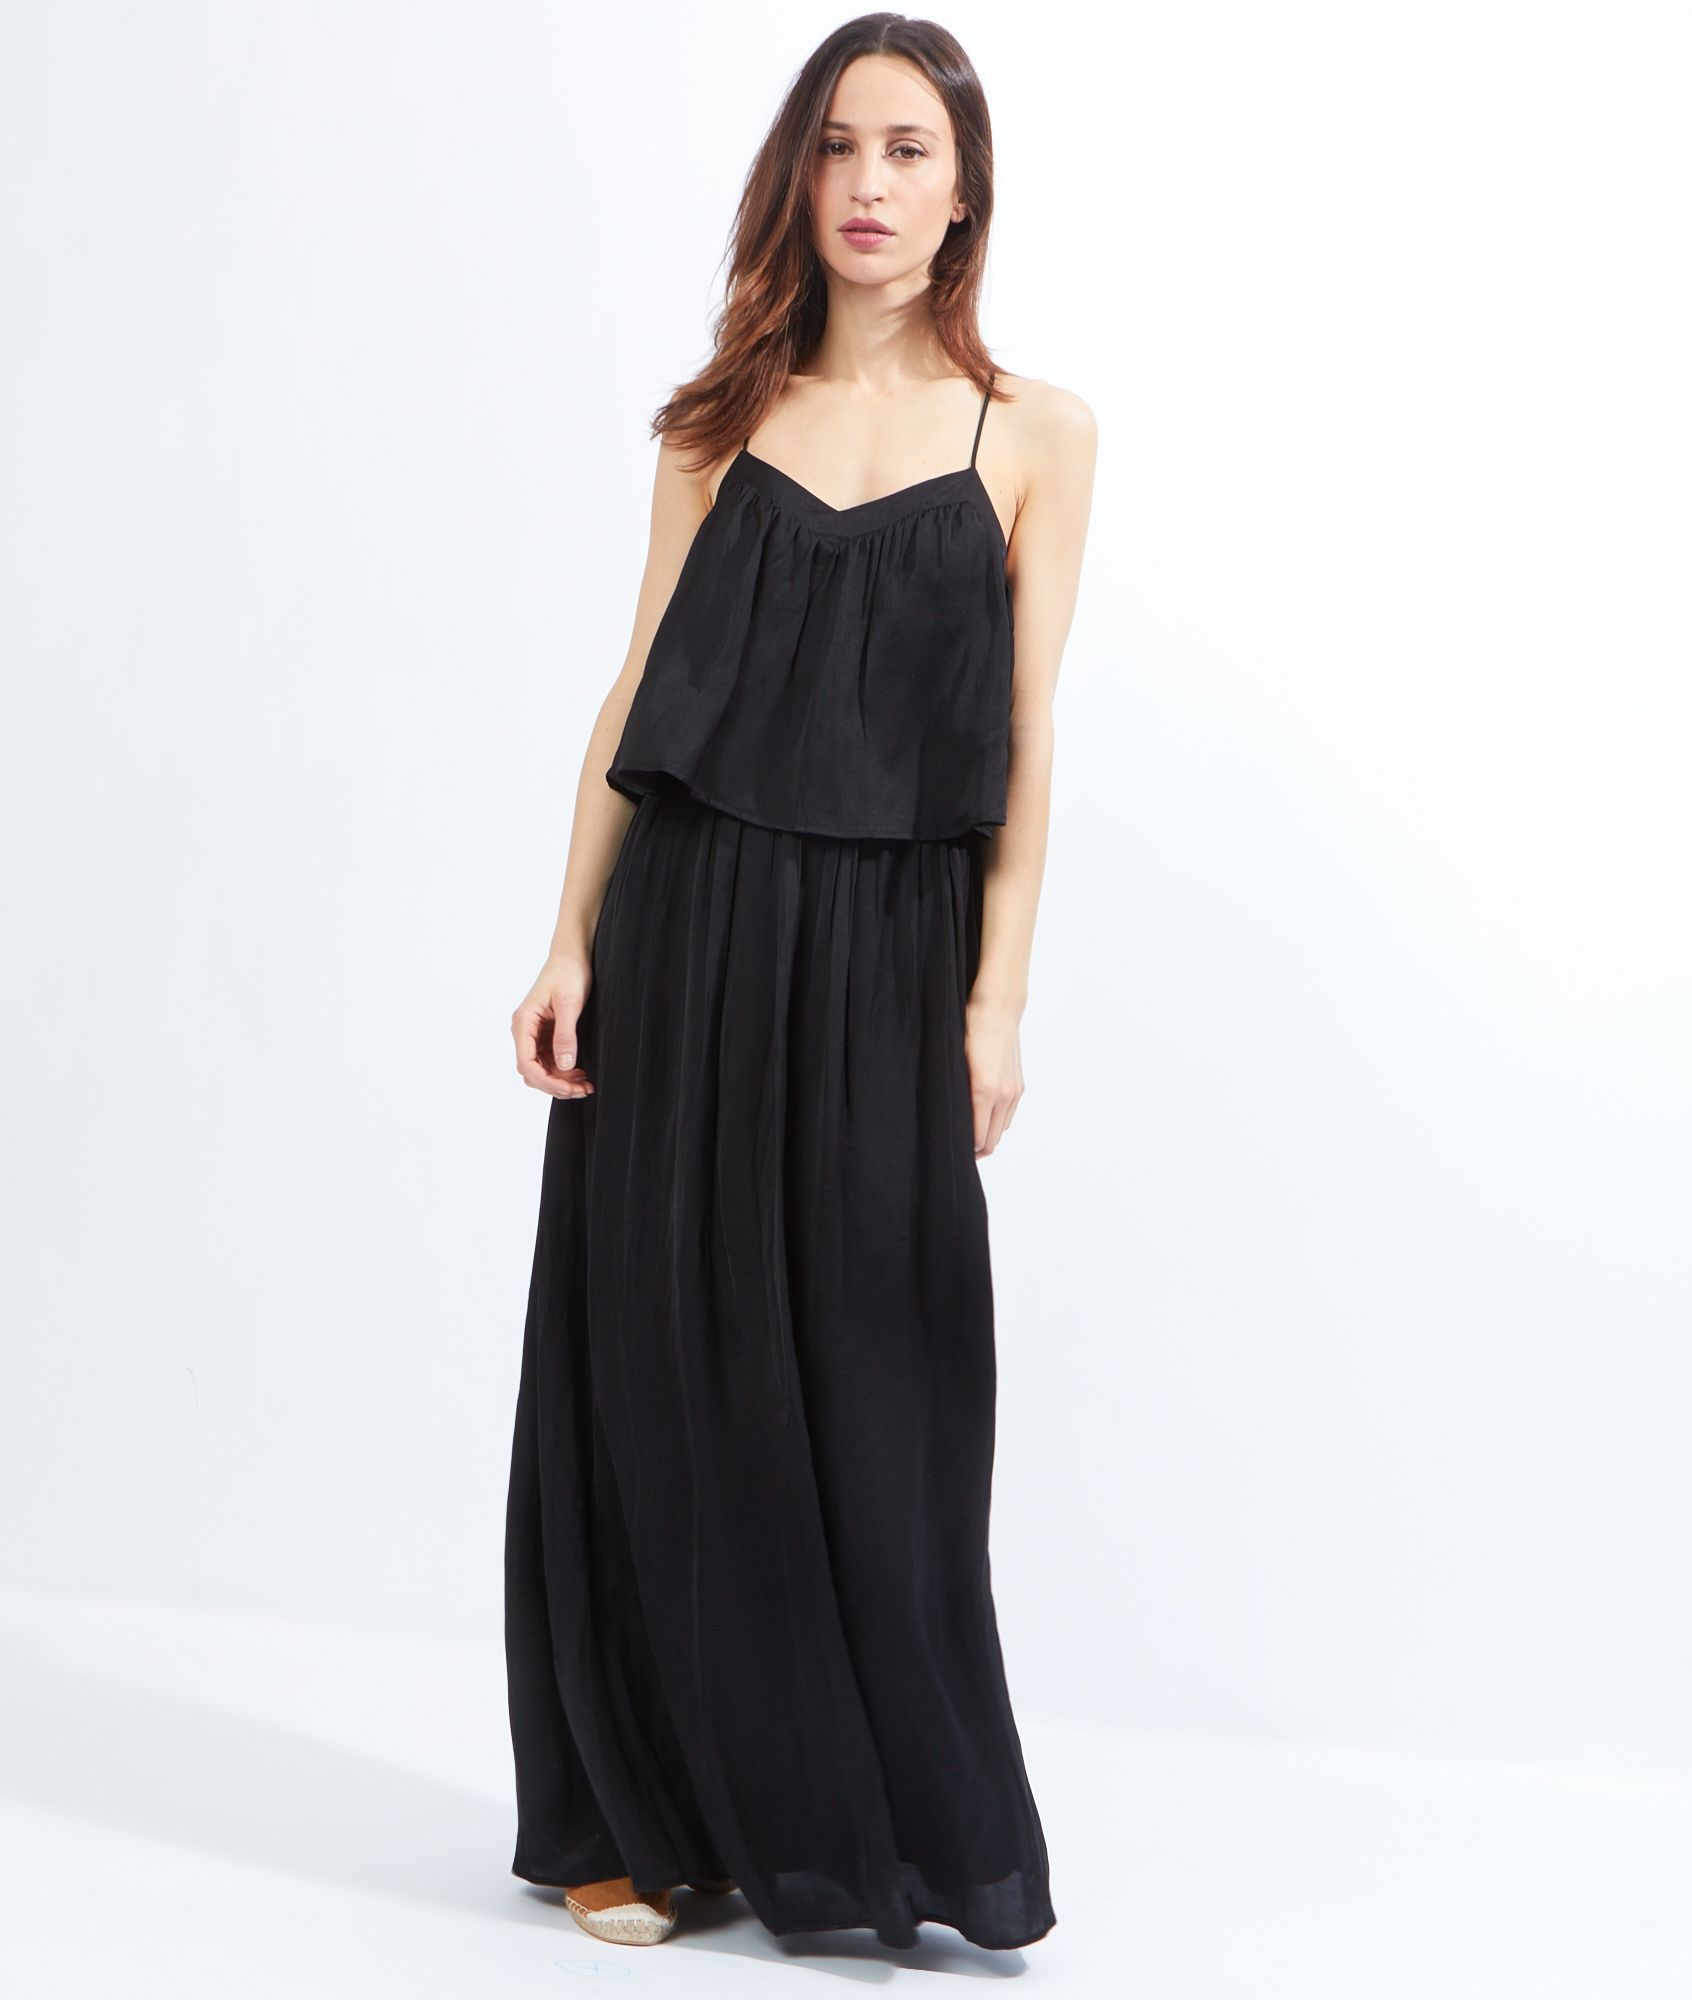 robe longue fluide volants loreta noir etam mode pinterest robe longue fluide. Black Bedroom Furniture Sets. Home Design Ideas